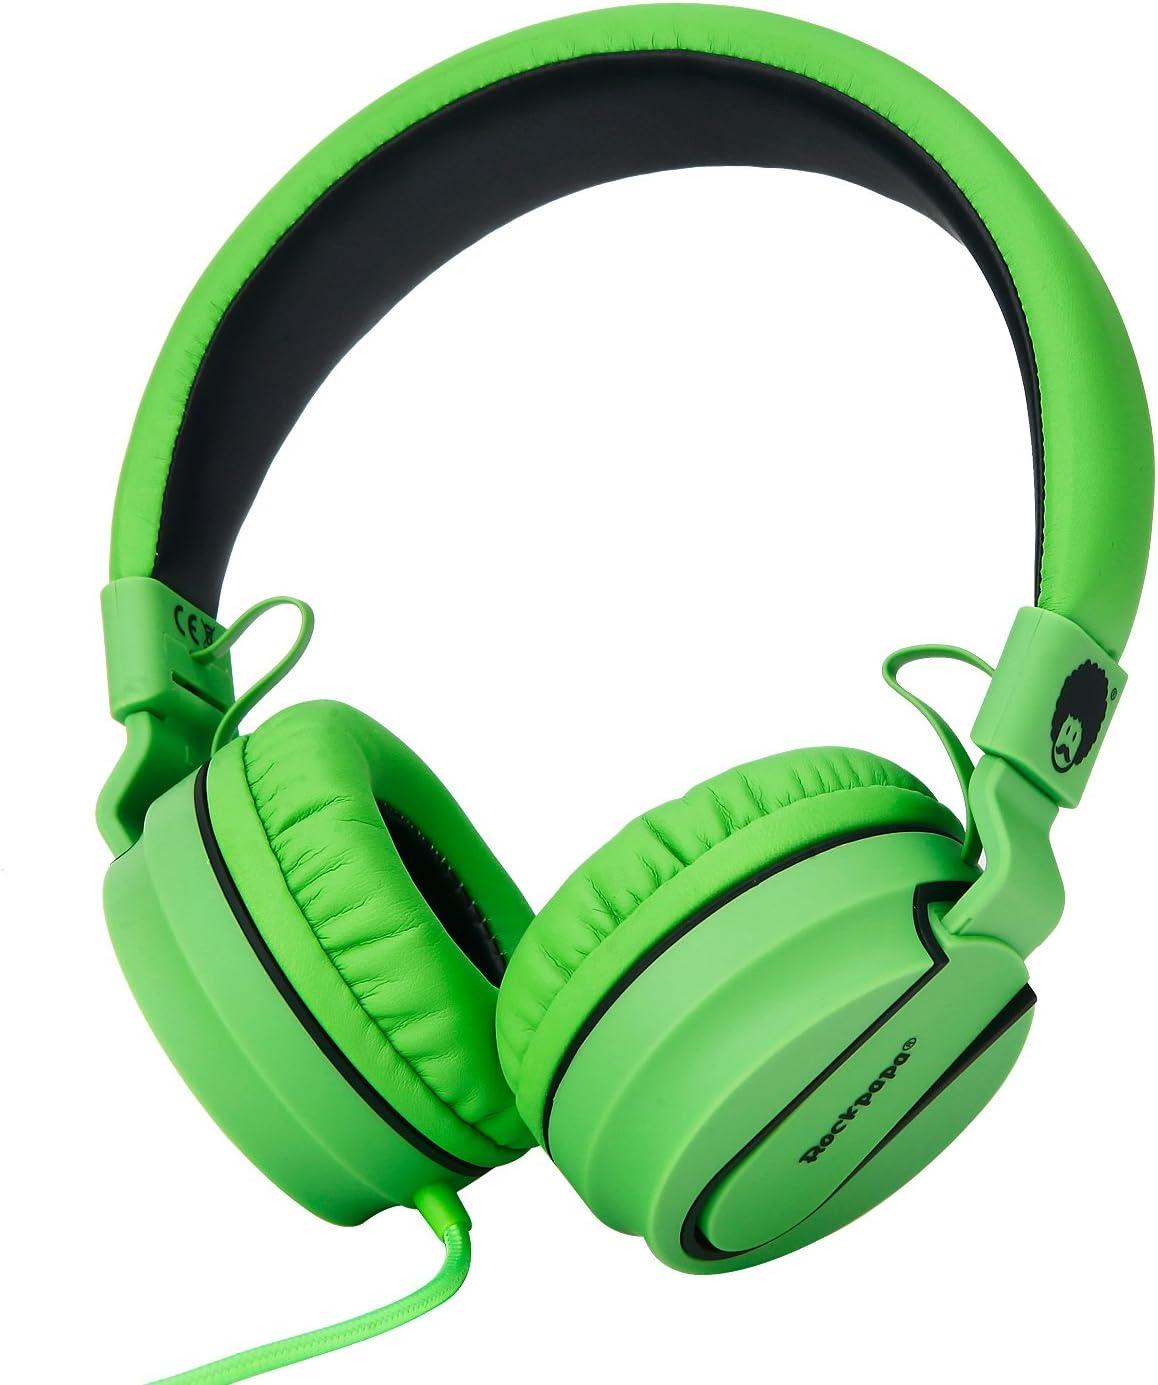 Rockpapa 950 Stereo Lightweight Foldable Headphones